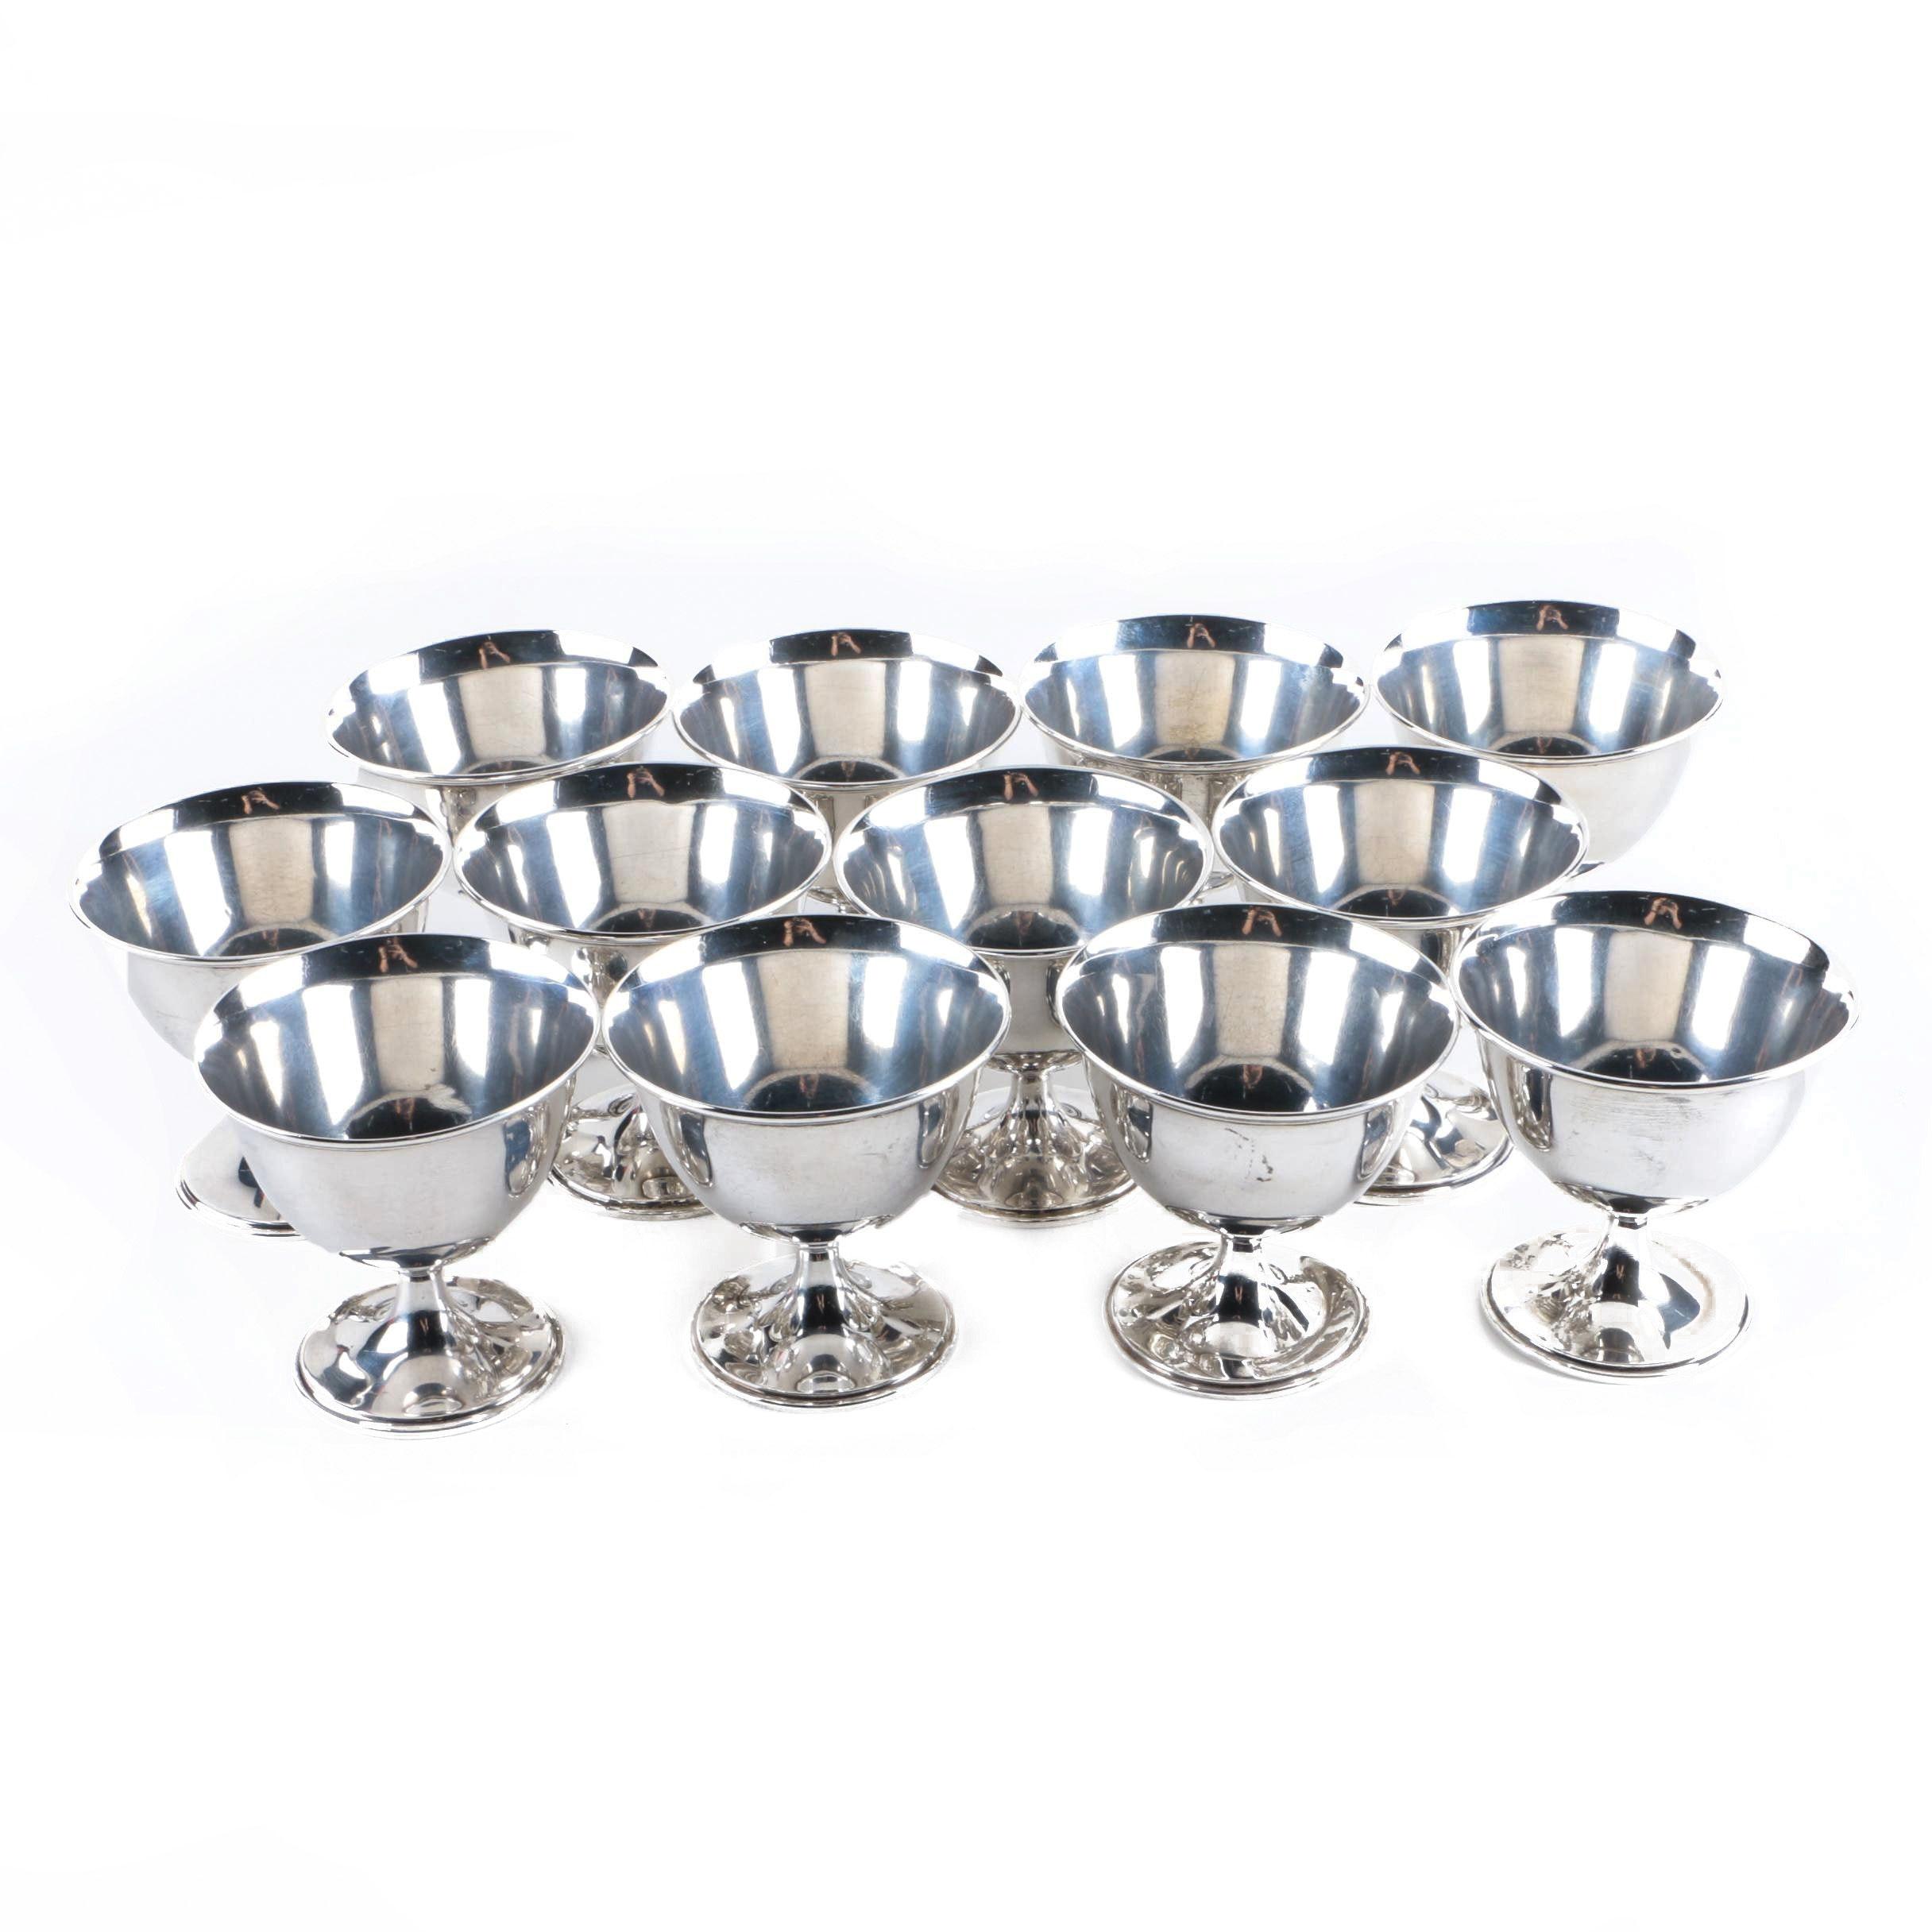 International Silver Co. Sterling Silver Sherbet Cups